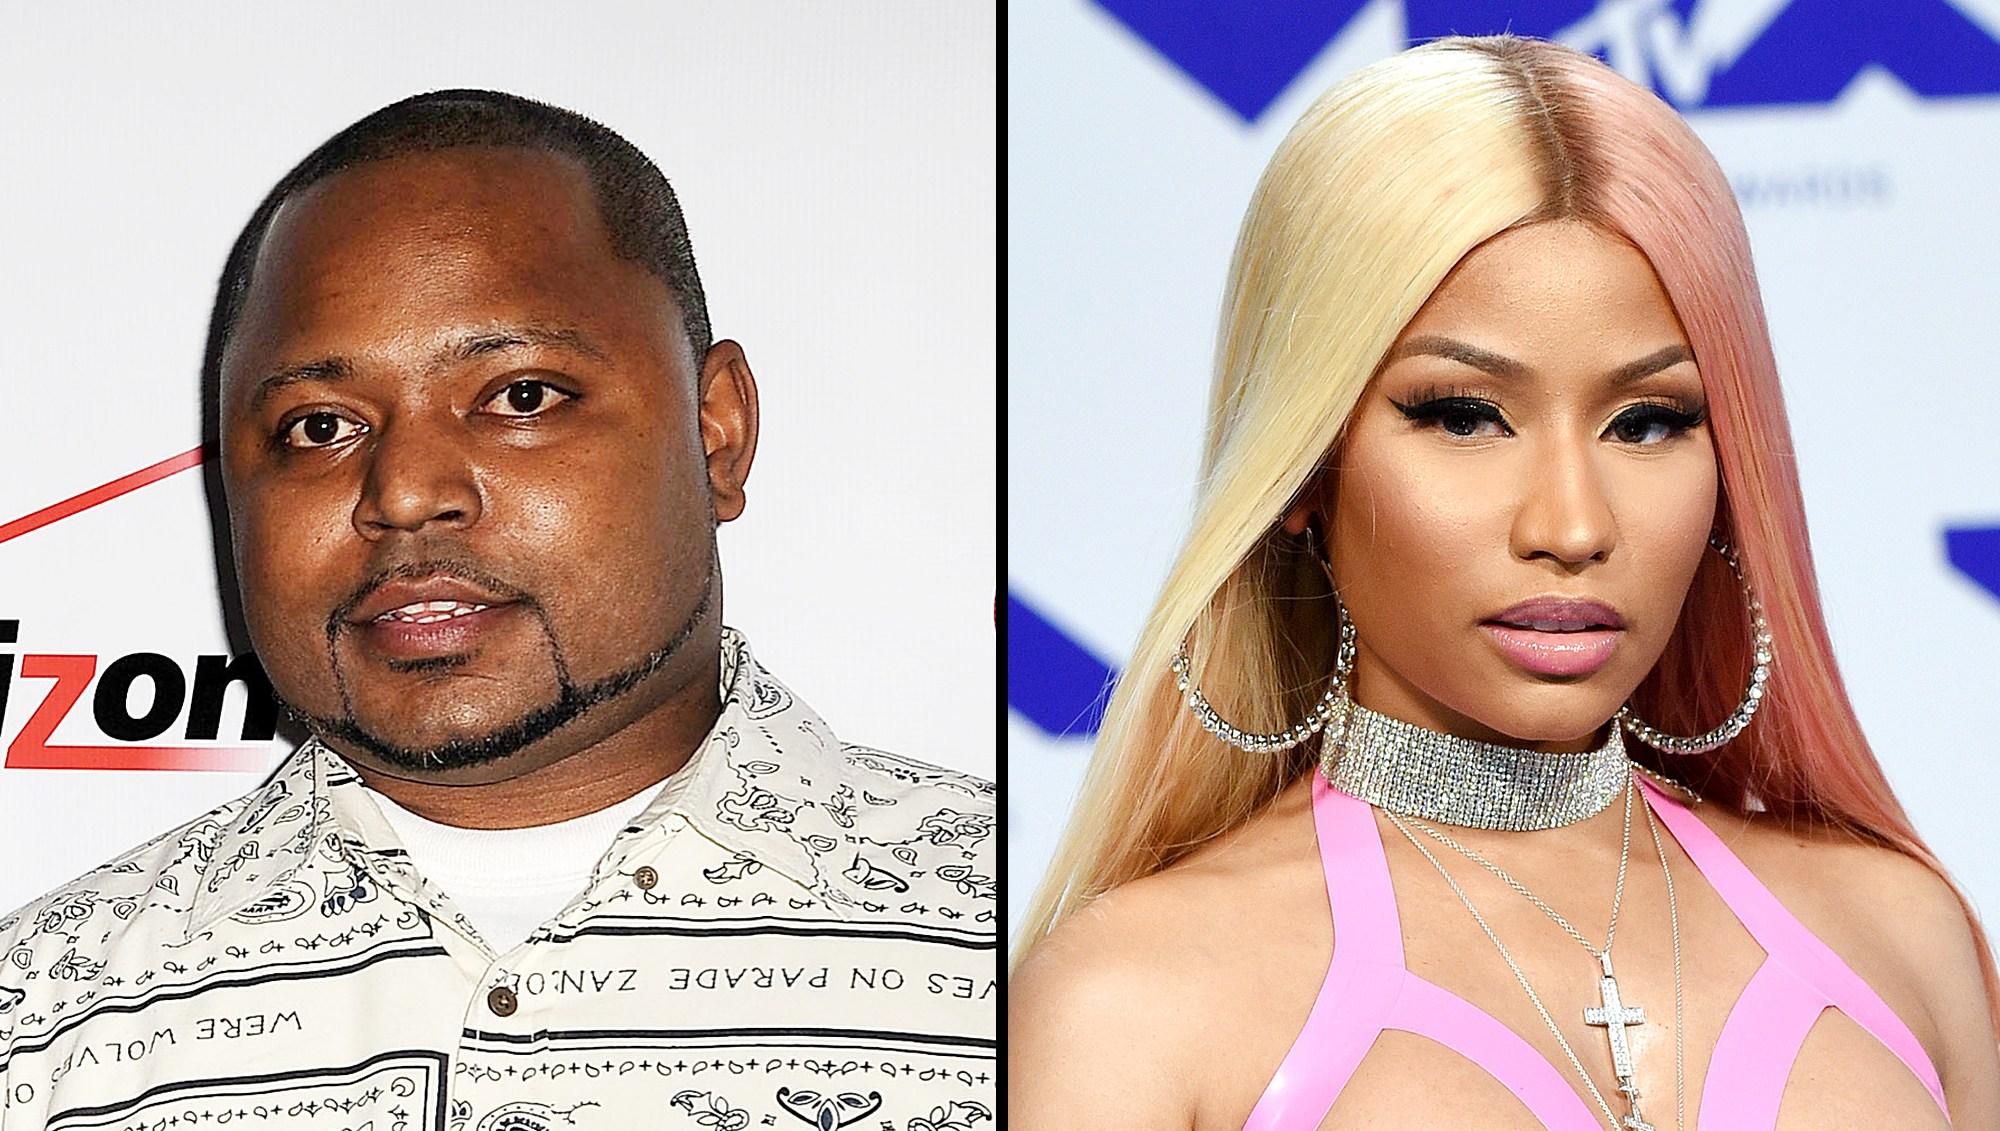 Nicki Minaj's Brother Jelani Maraj Convicted In Rape Case Of 11-Year-Old Girl: Found Guilty